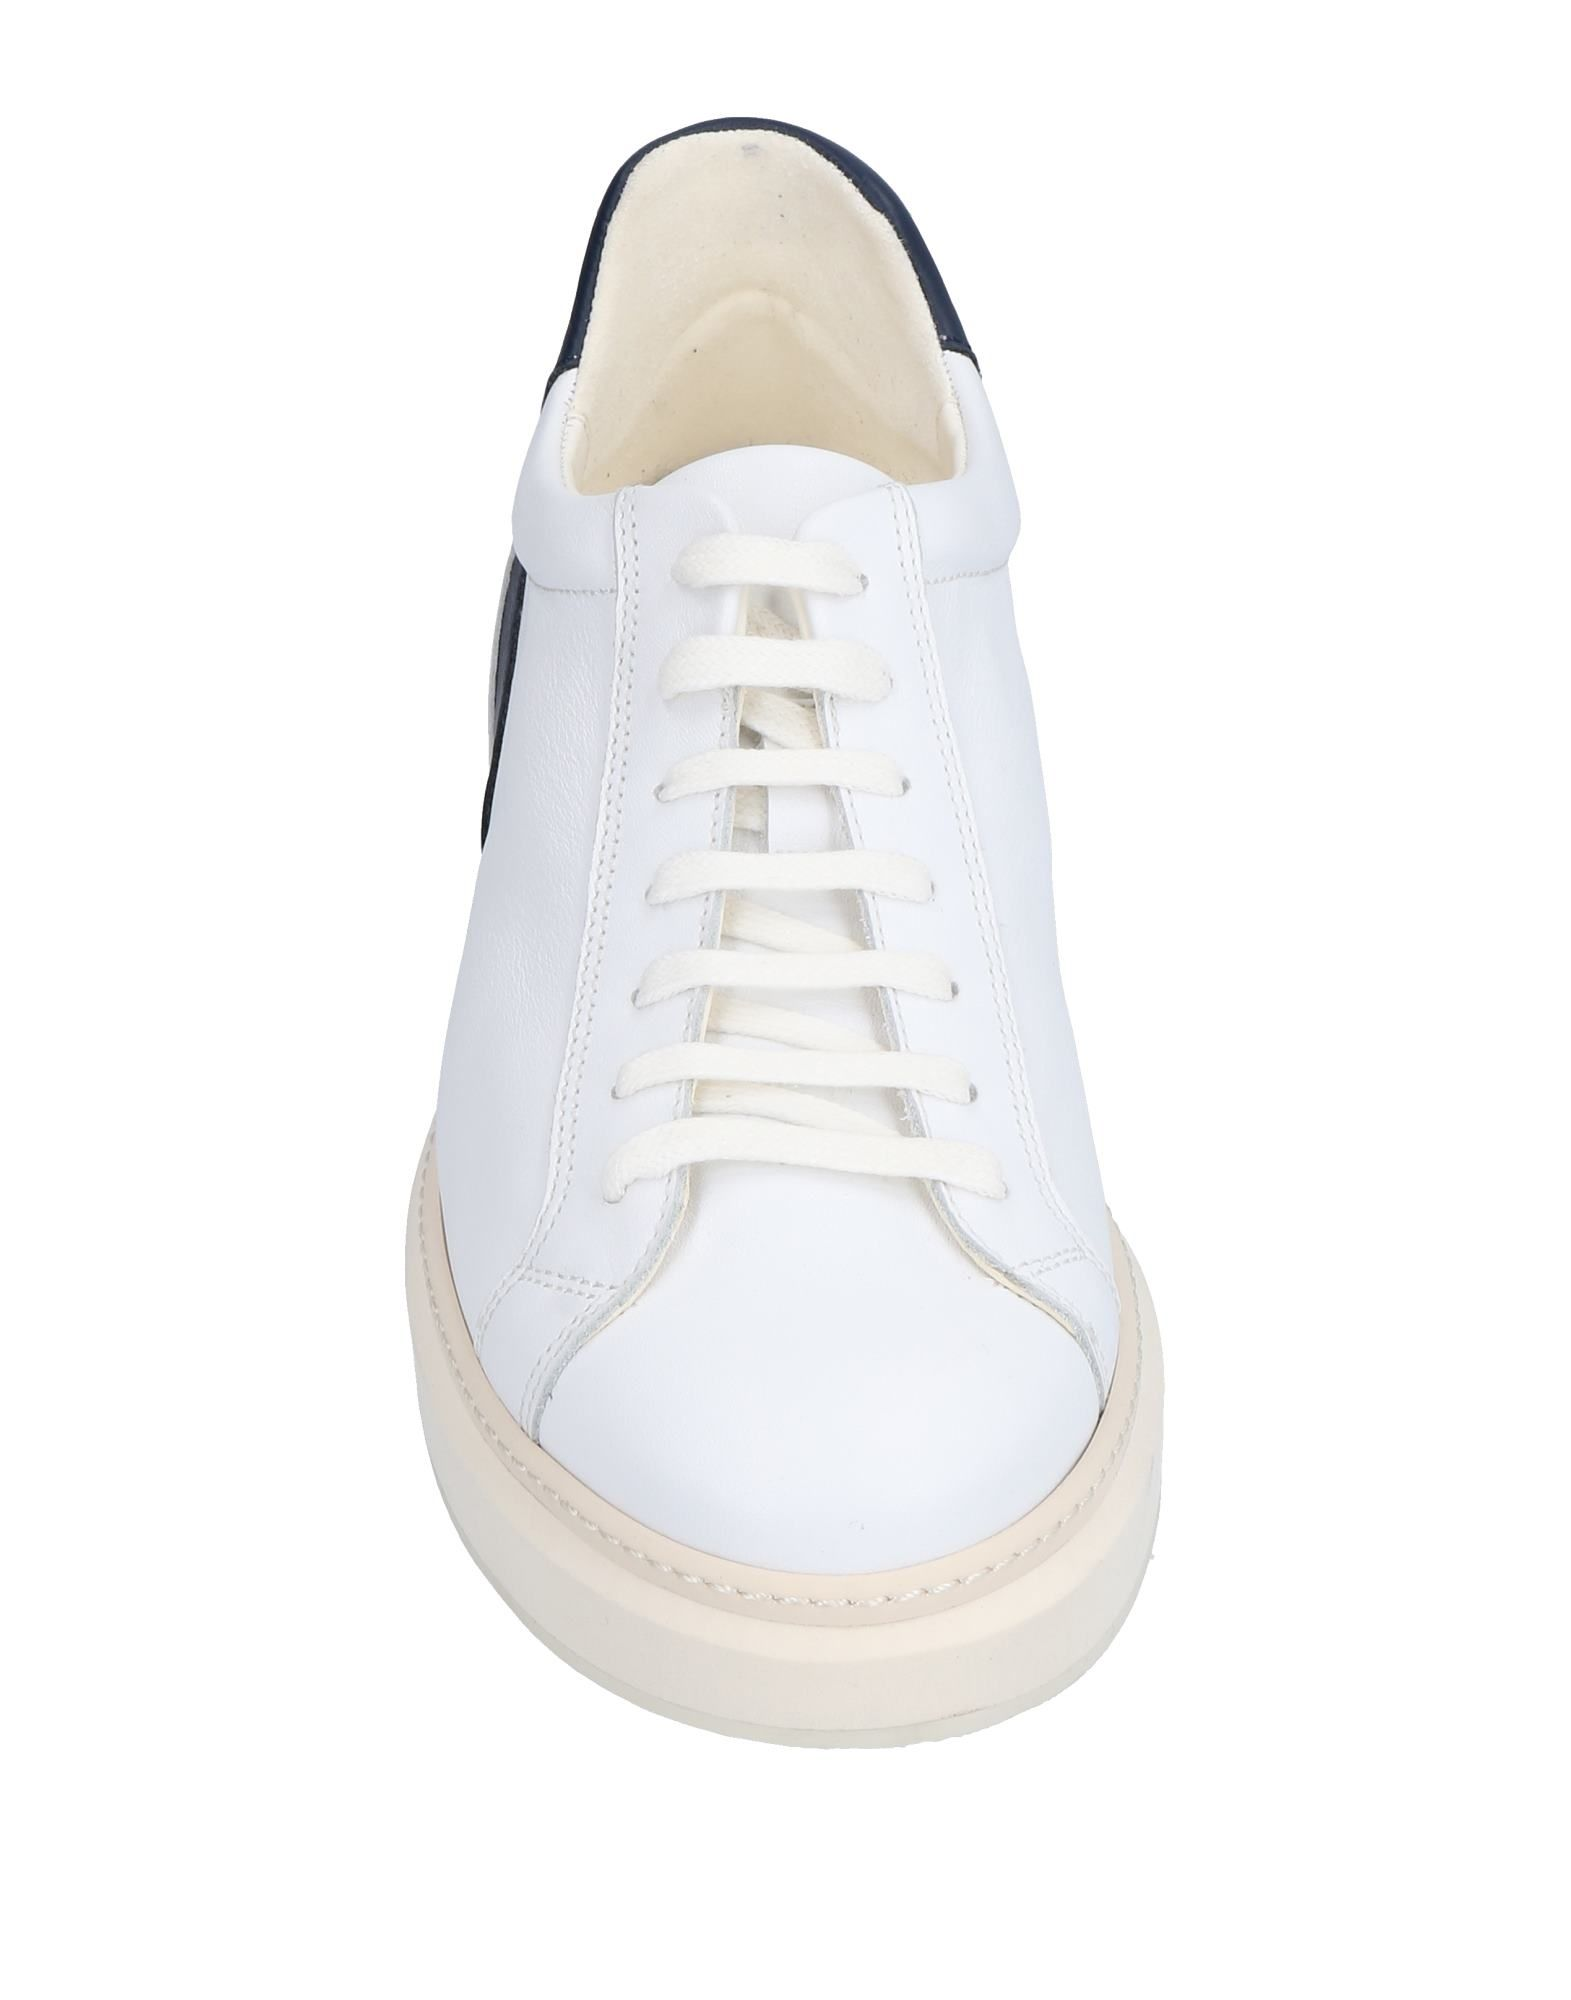 Manuel Manuel Manuel Barceló Sneakers Herren  11517173RN b60890